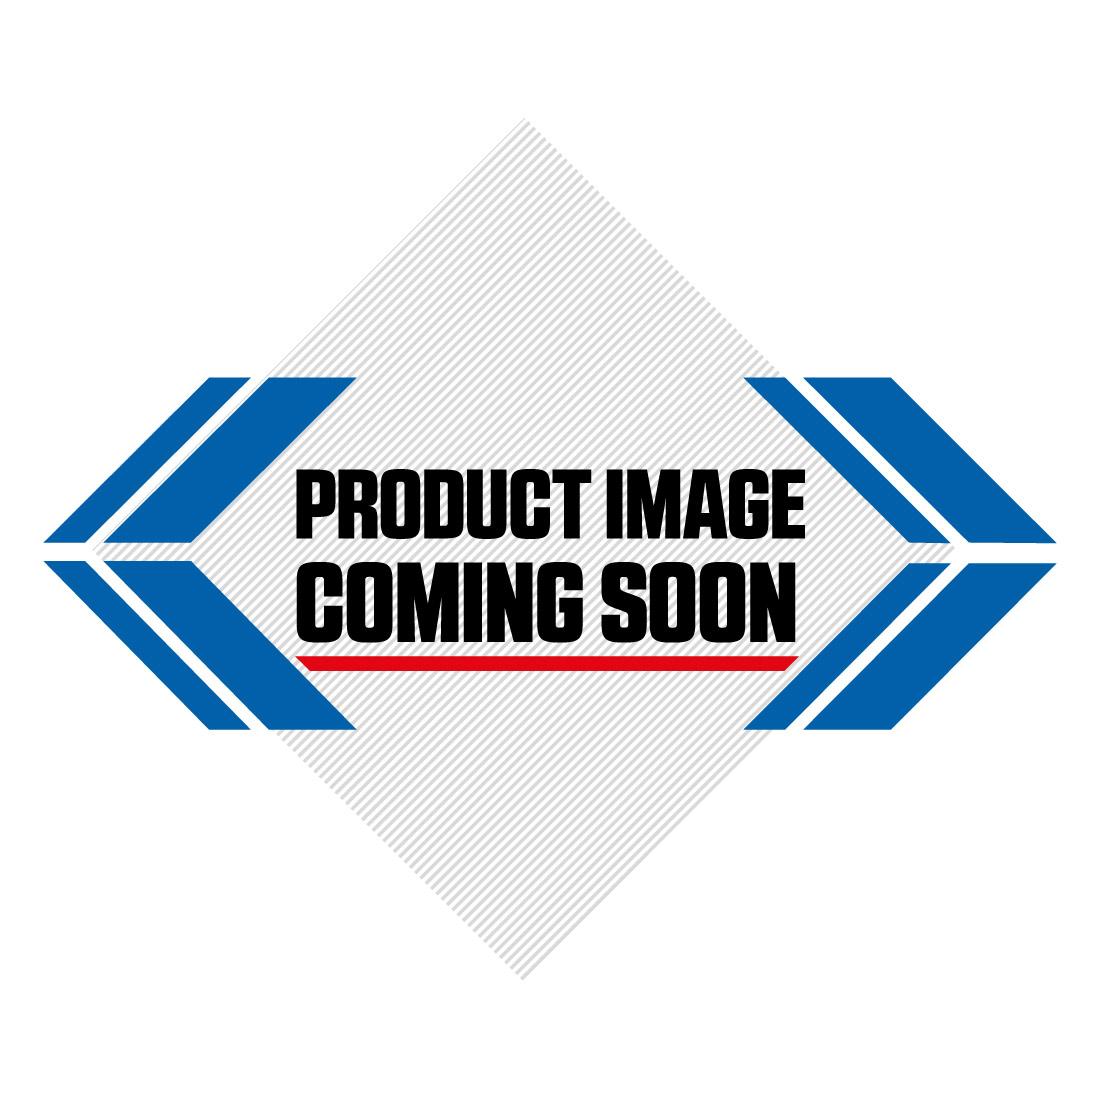 Honda Plastic Kit CR 125 (87-88) OEM Factory (1988) Image-3>